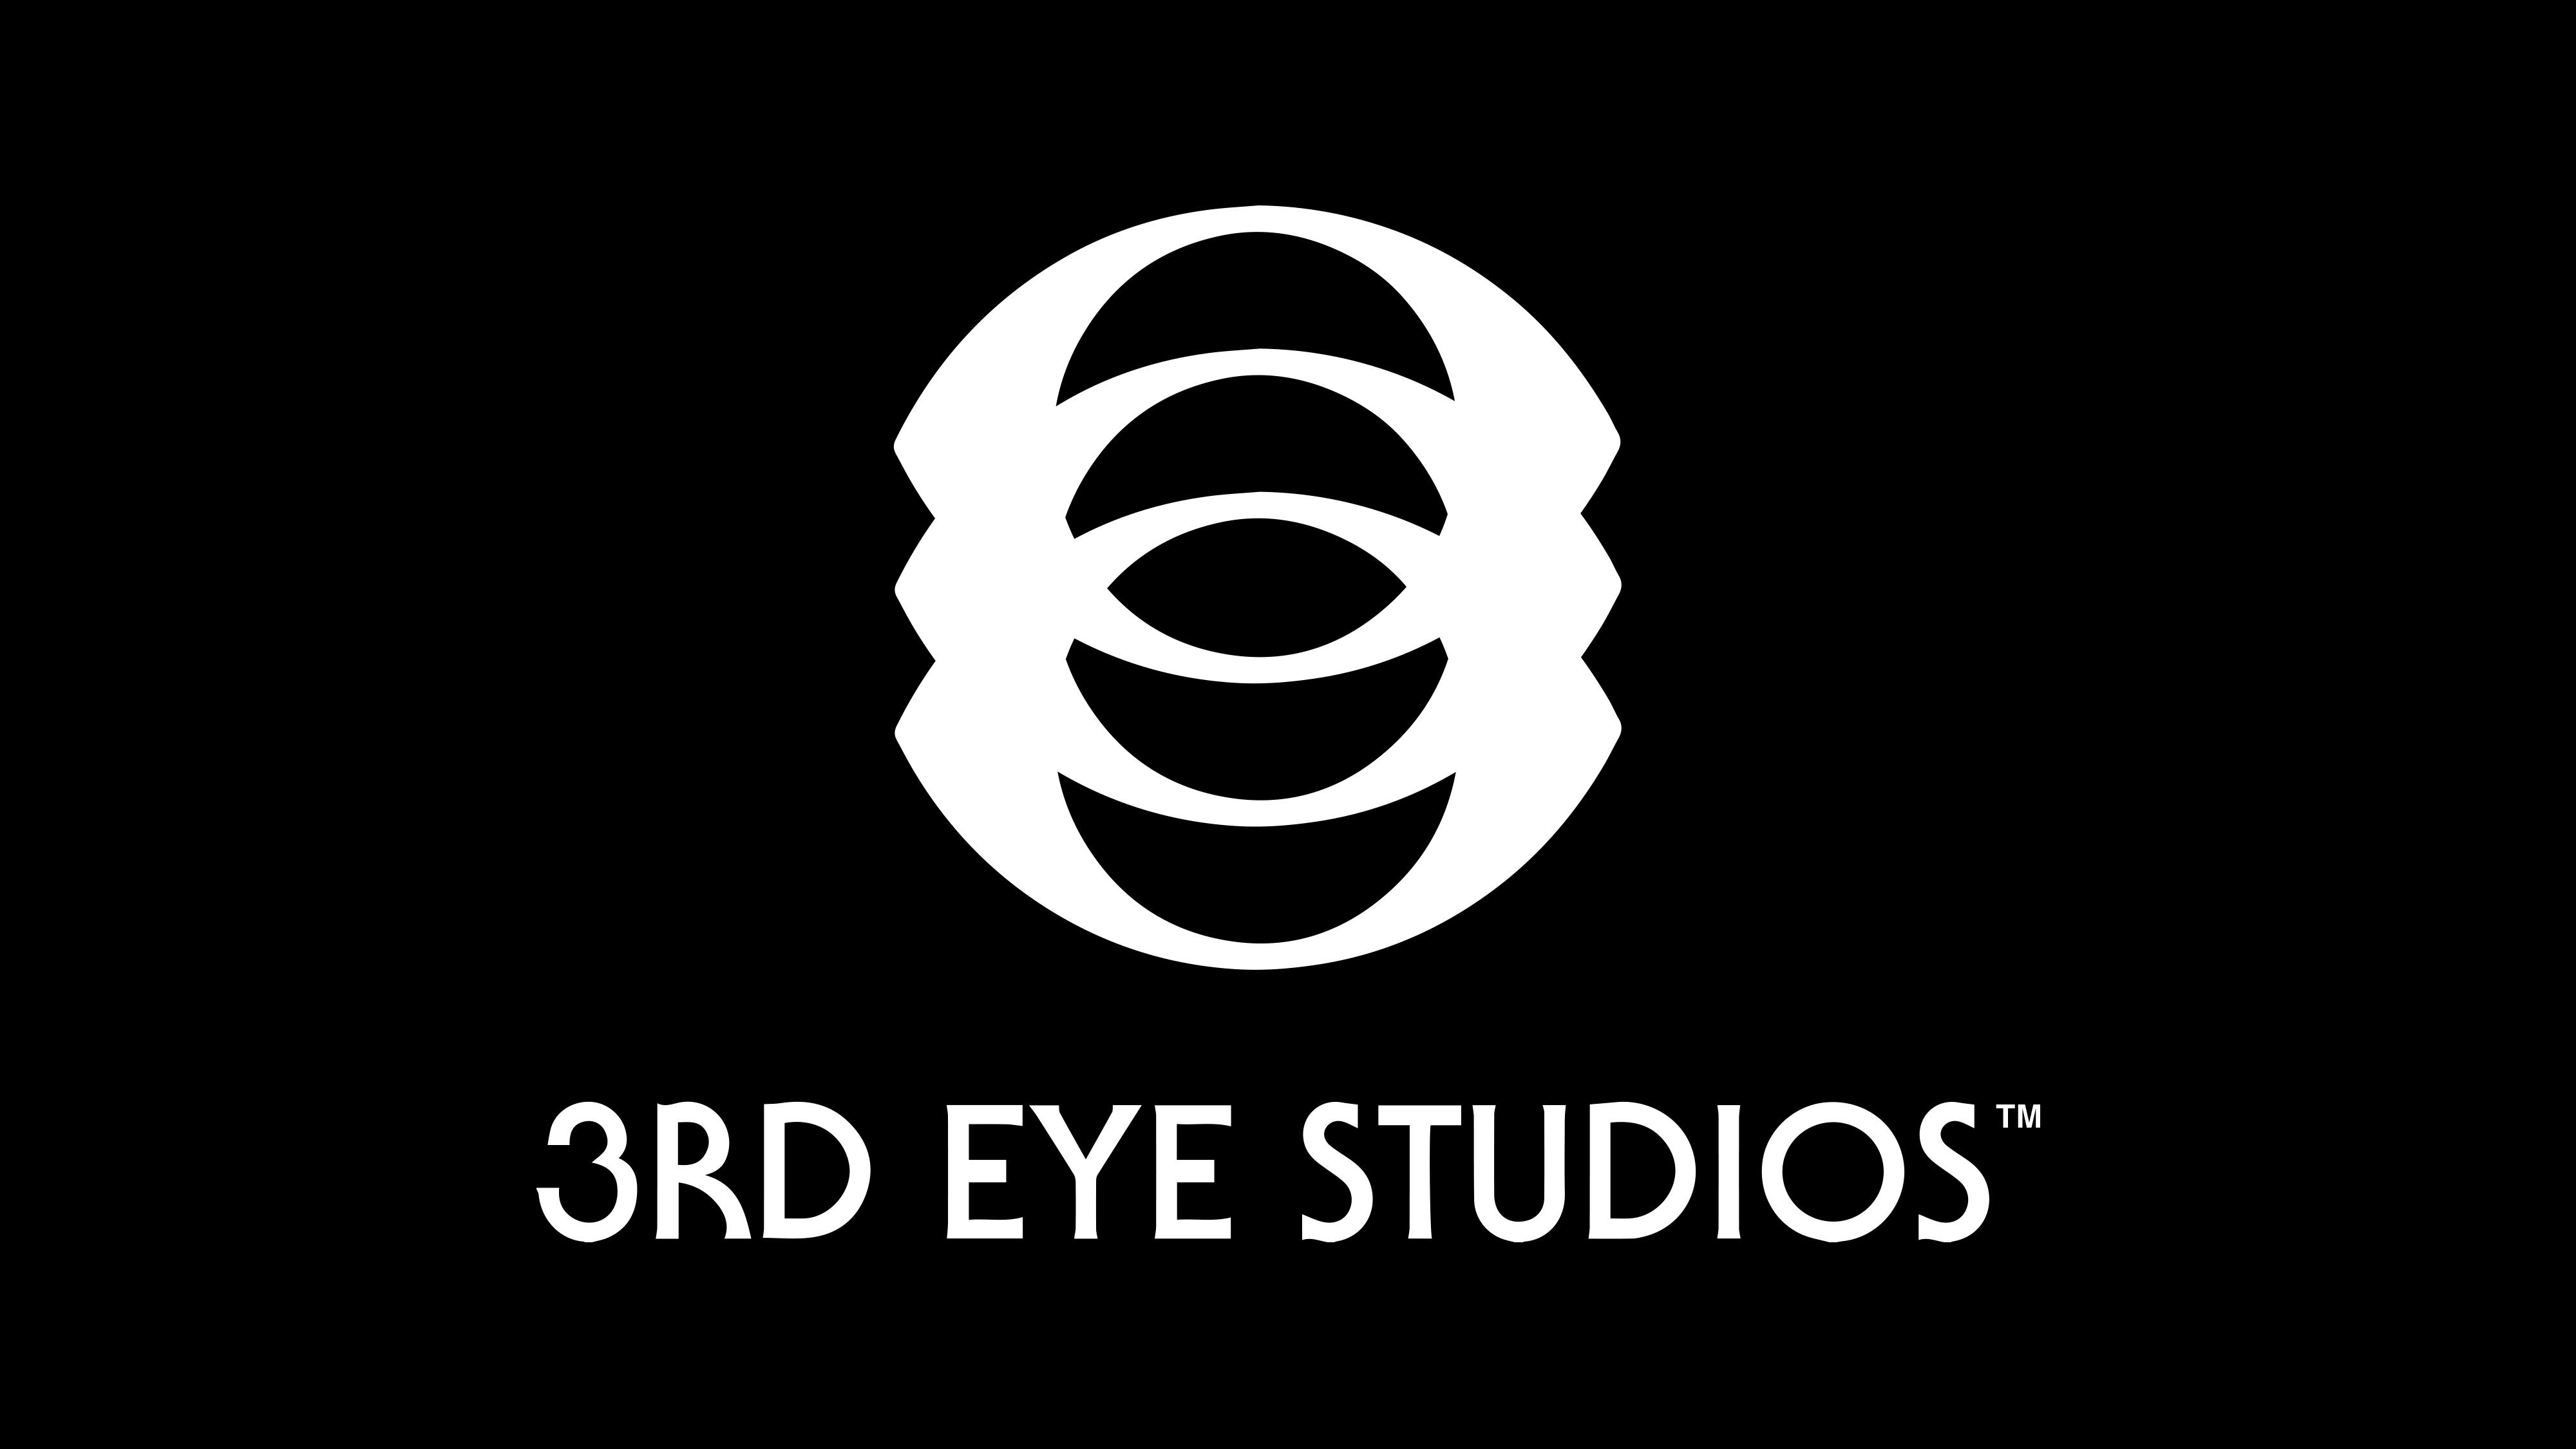 3rd Eye Studios Logo